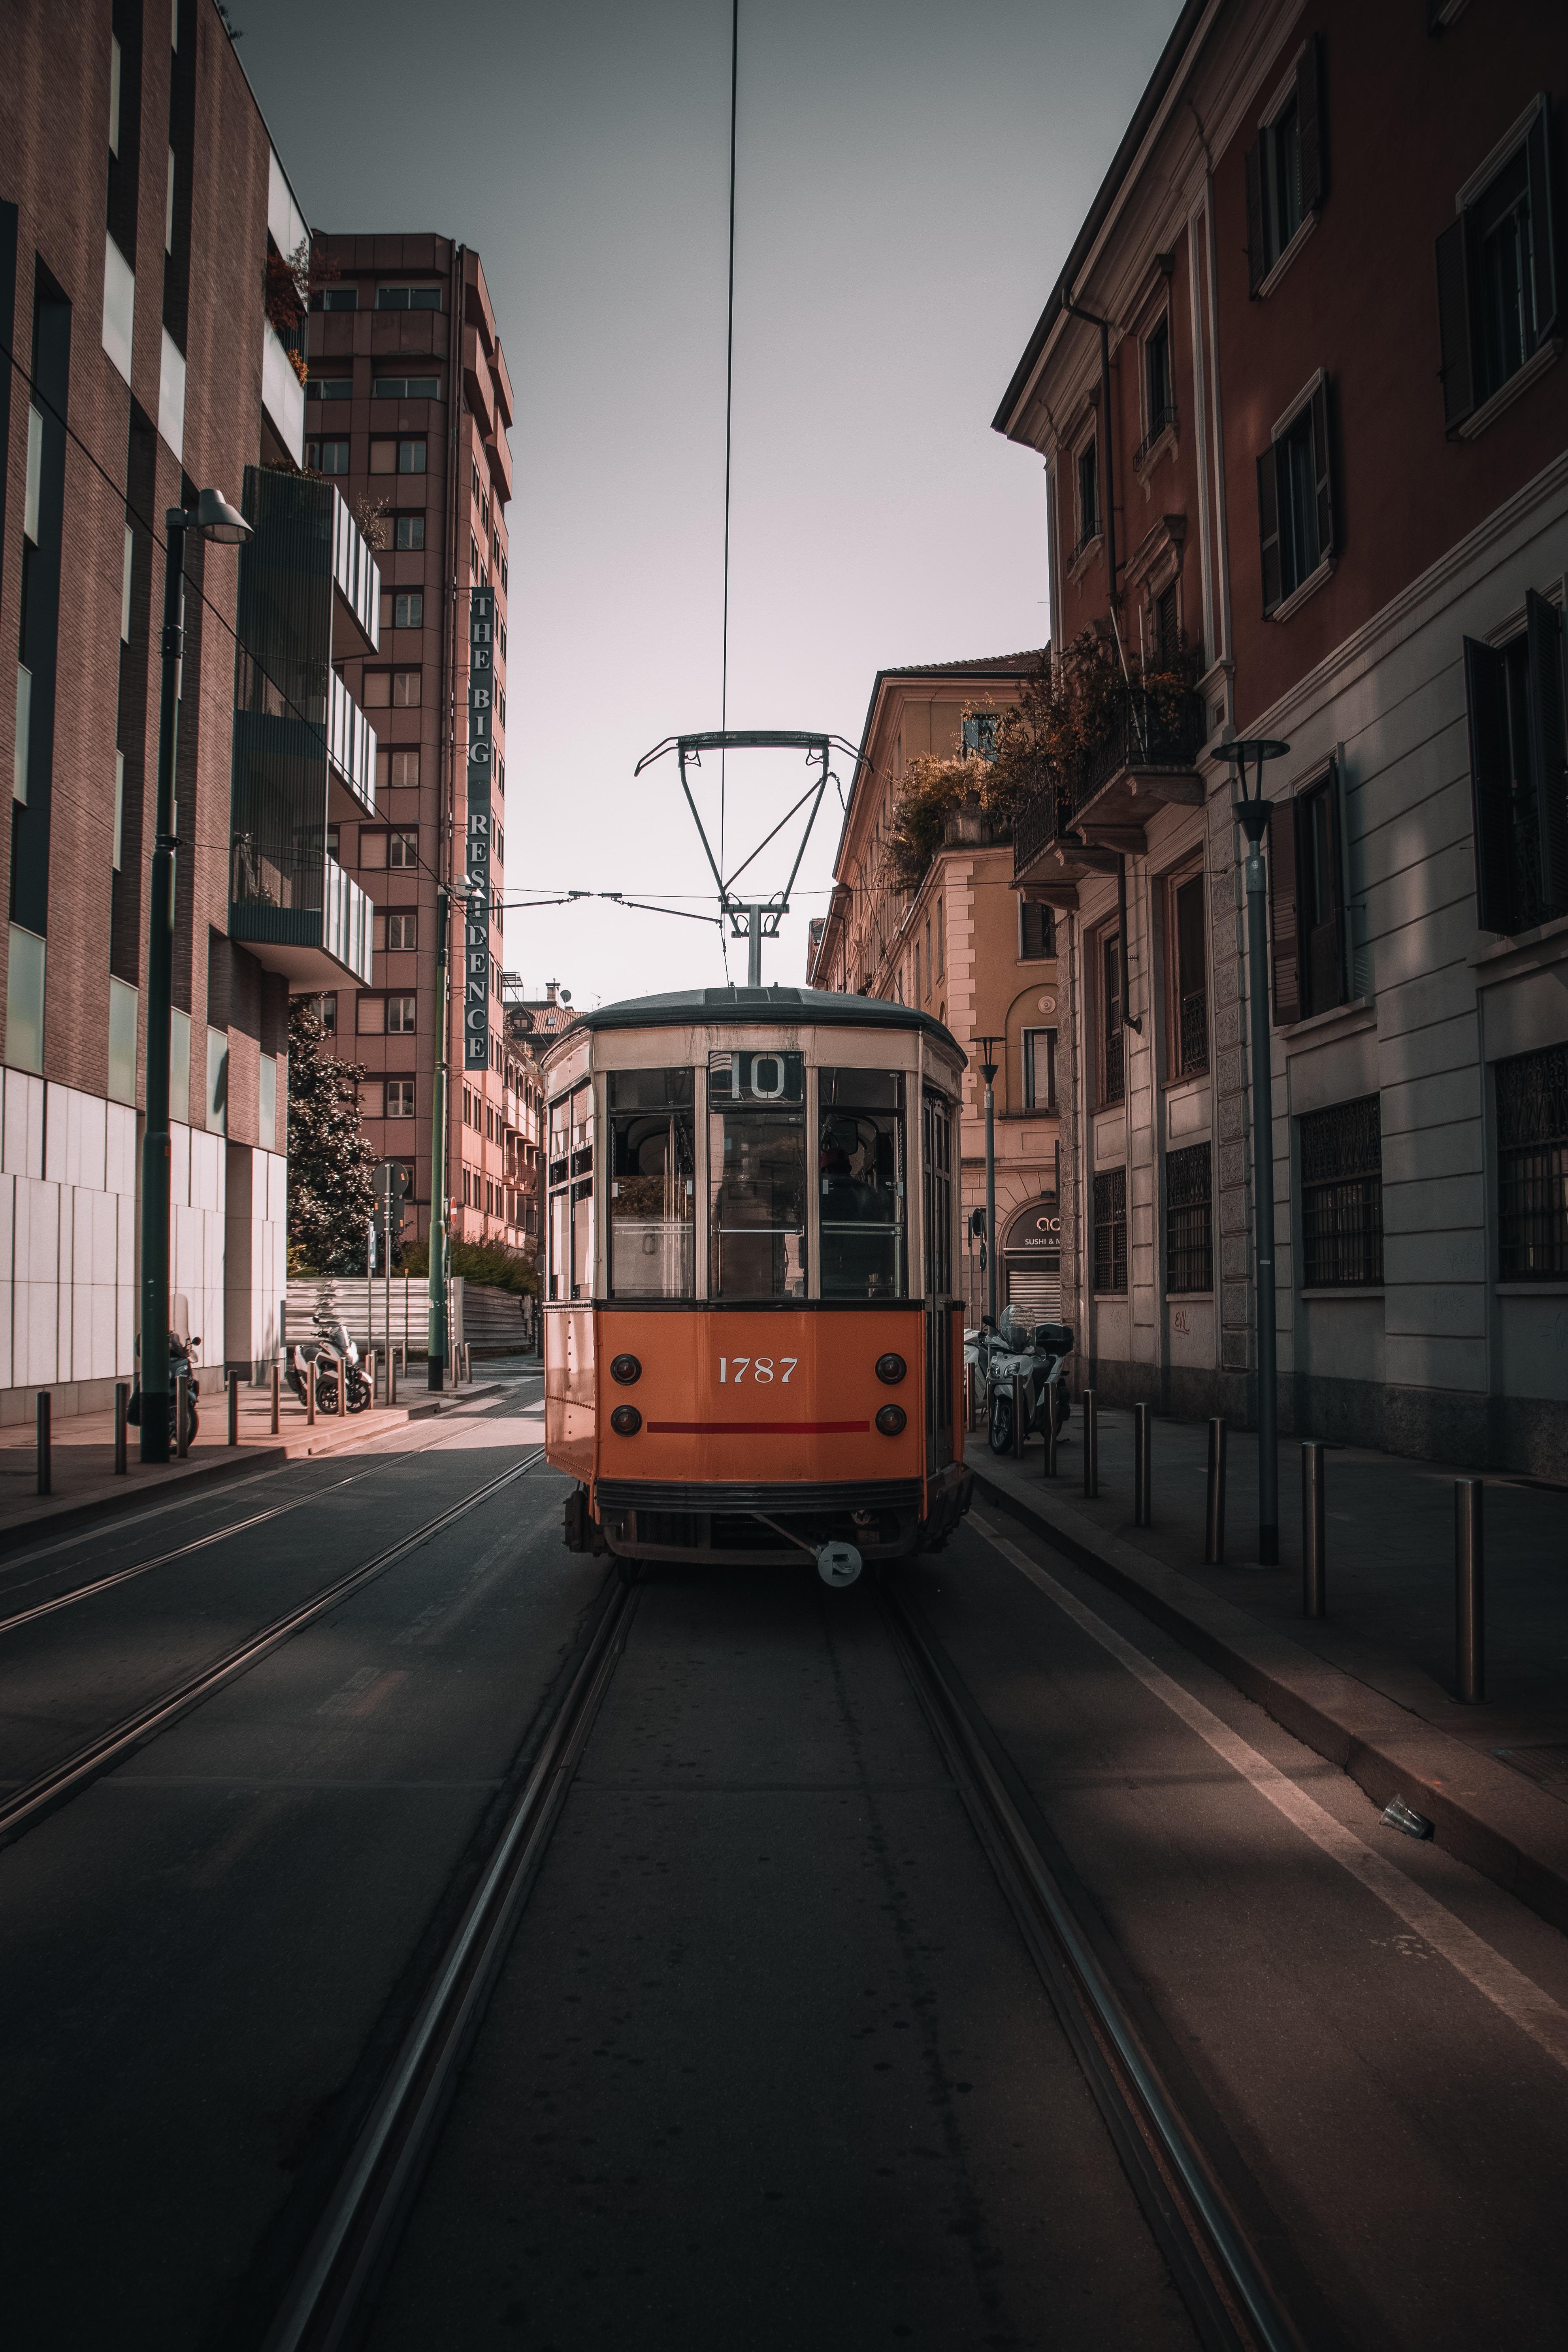 orange and gray train